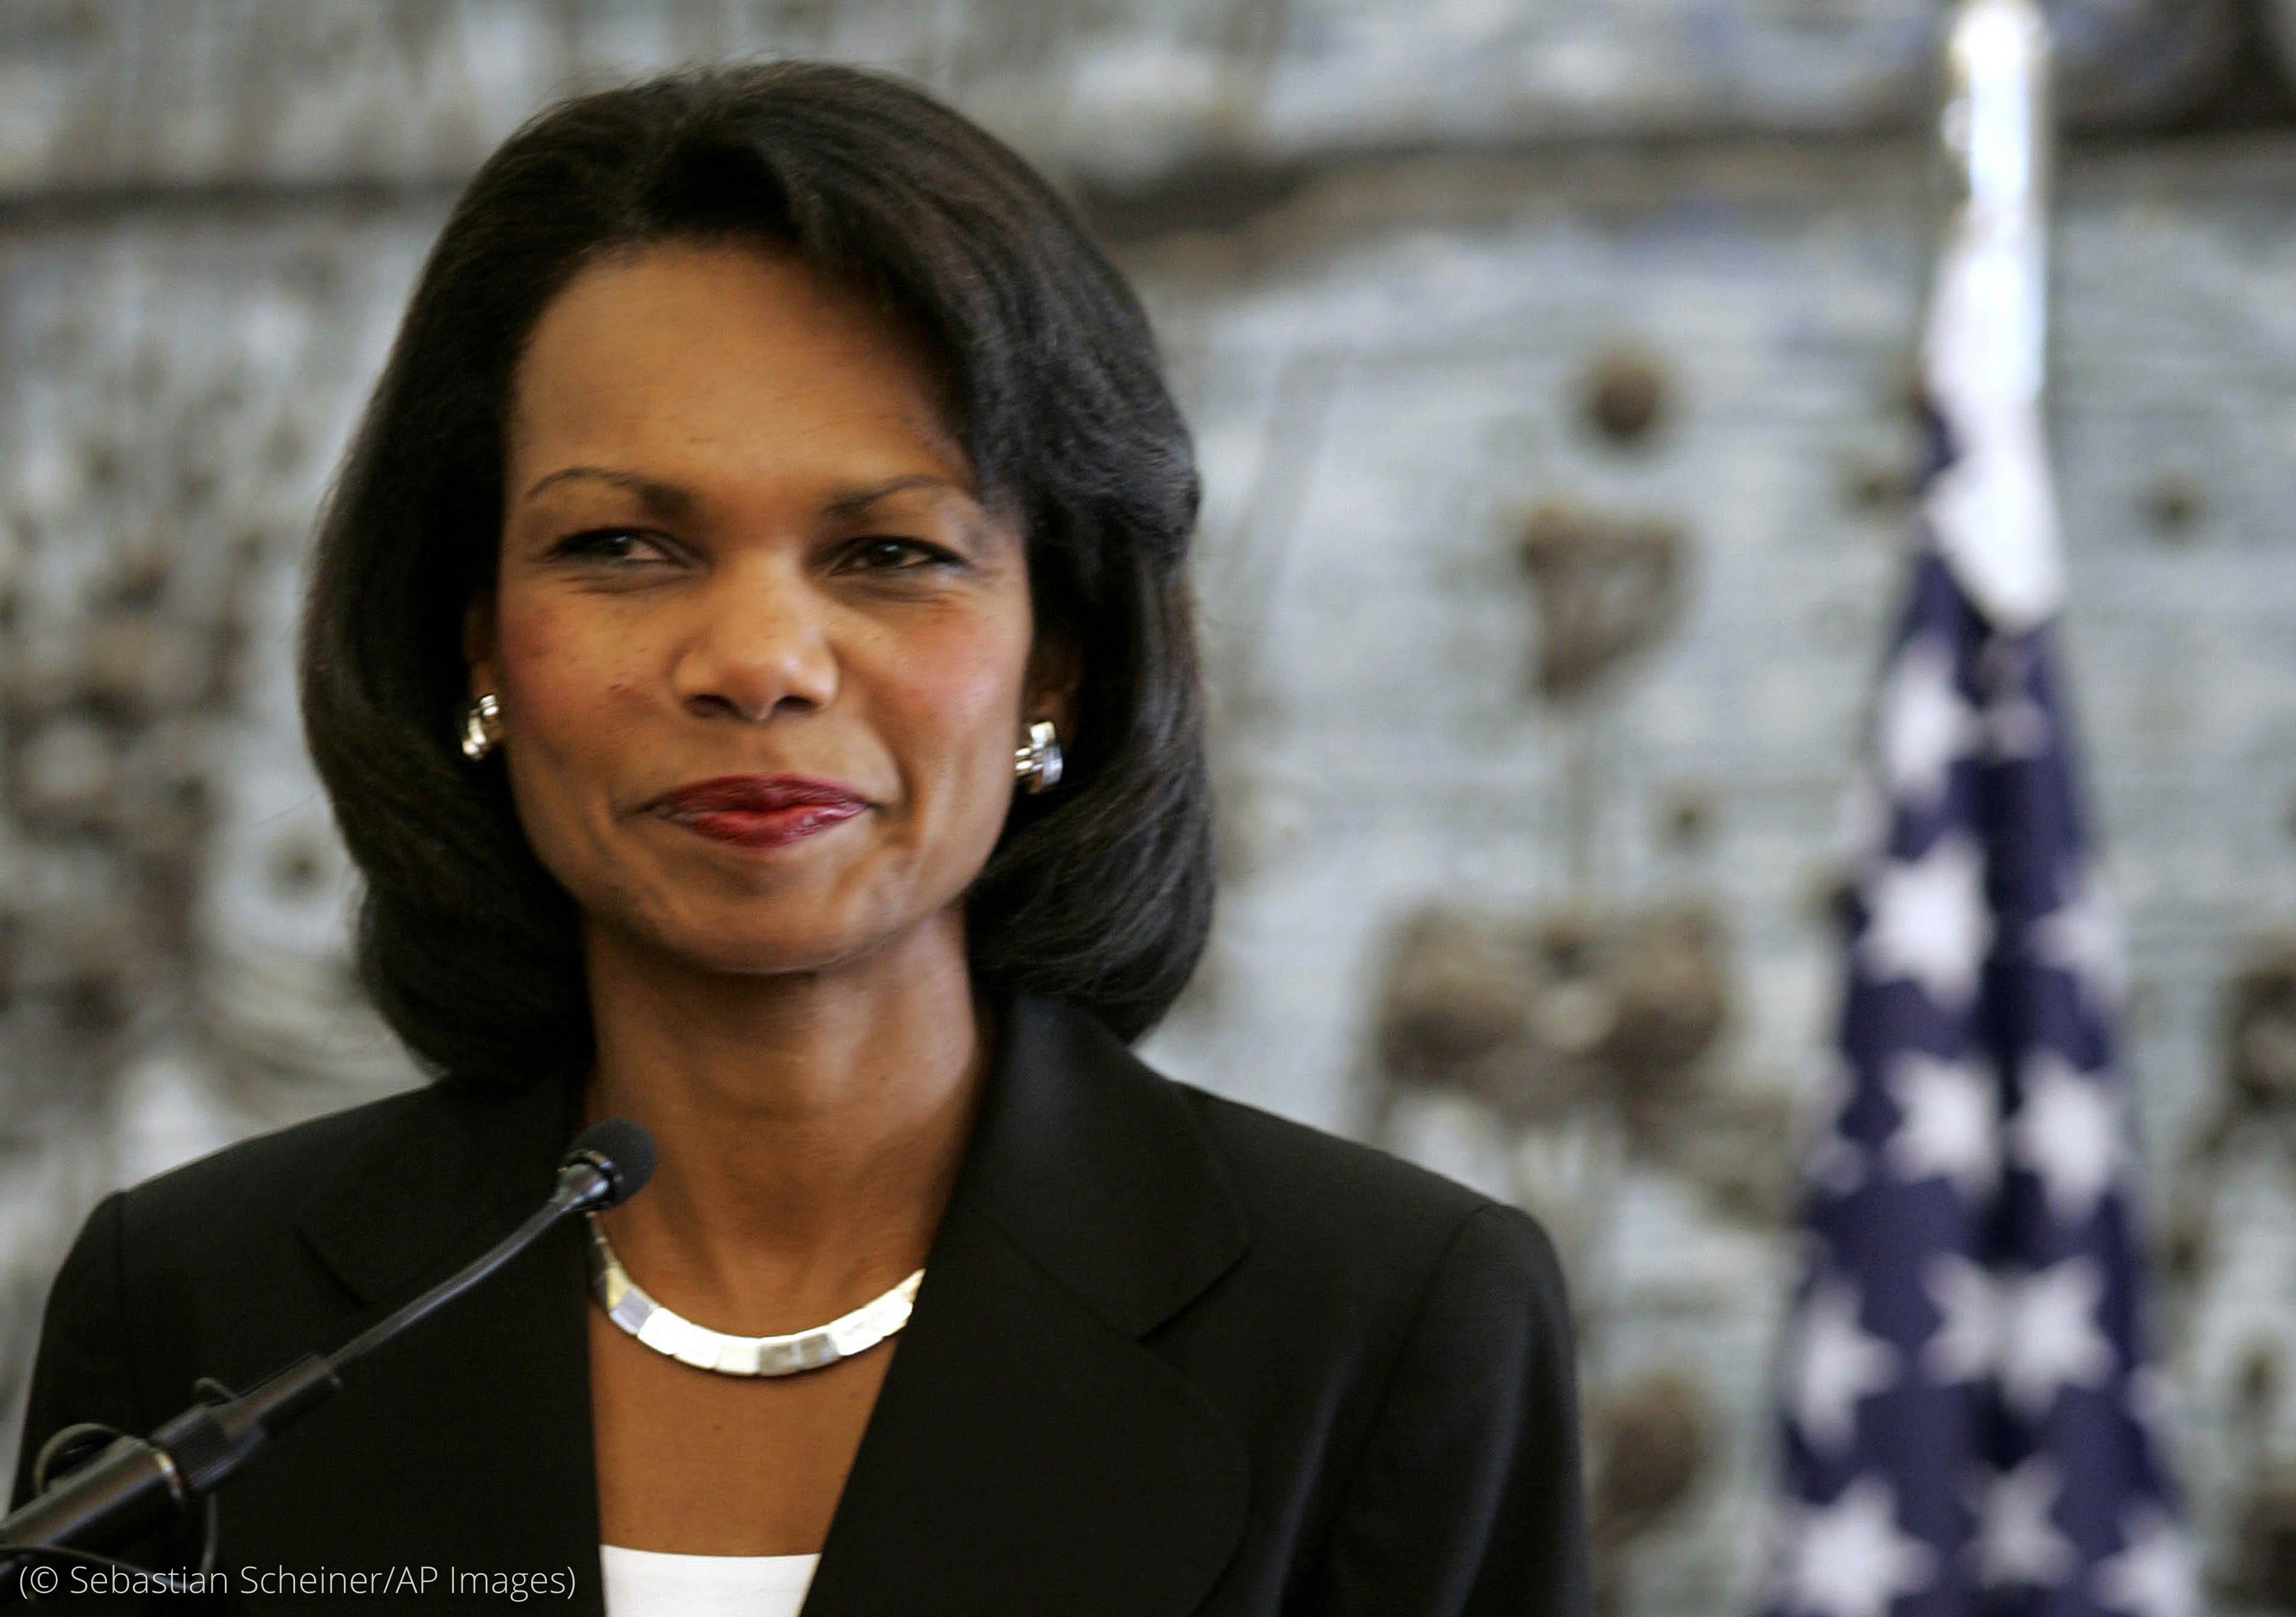 Condoleezza Rice (© Sebastian Scheiner/AP Images)